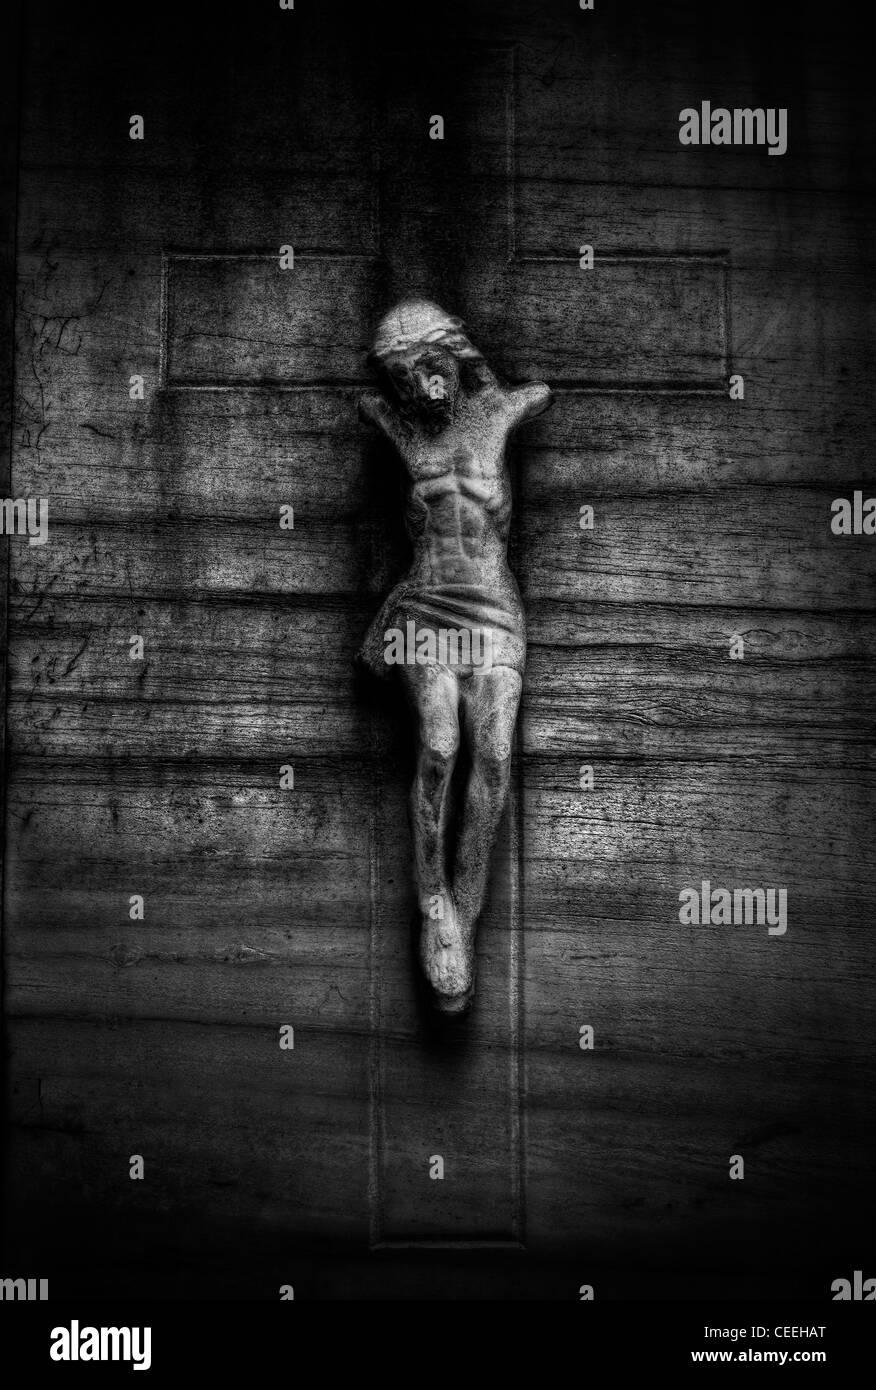 Broken crucifix on wall - Stock Image